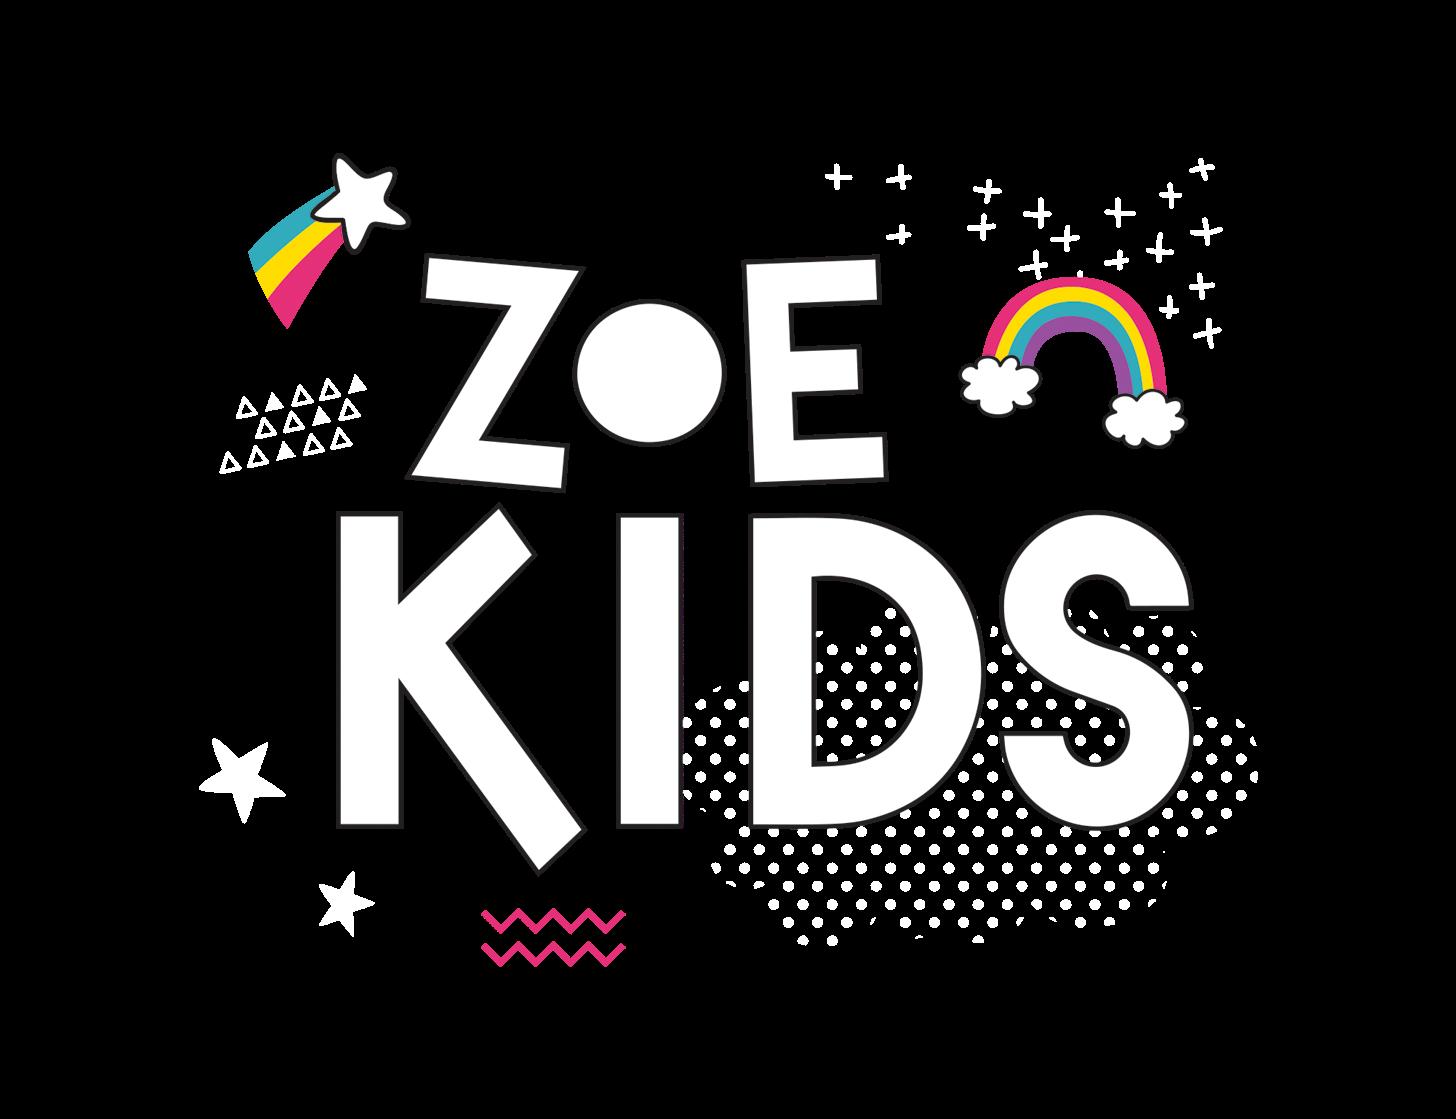 Zoe Kids Logo with Shooting star and rainbow